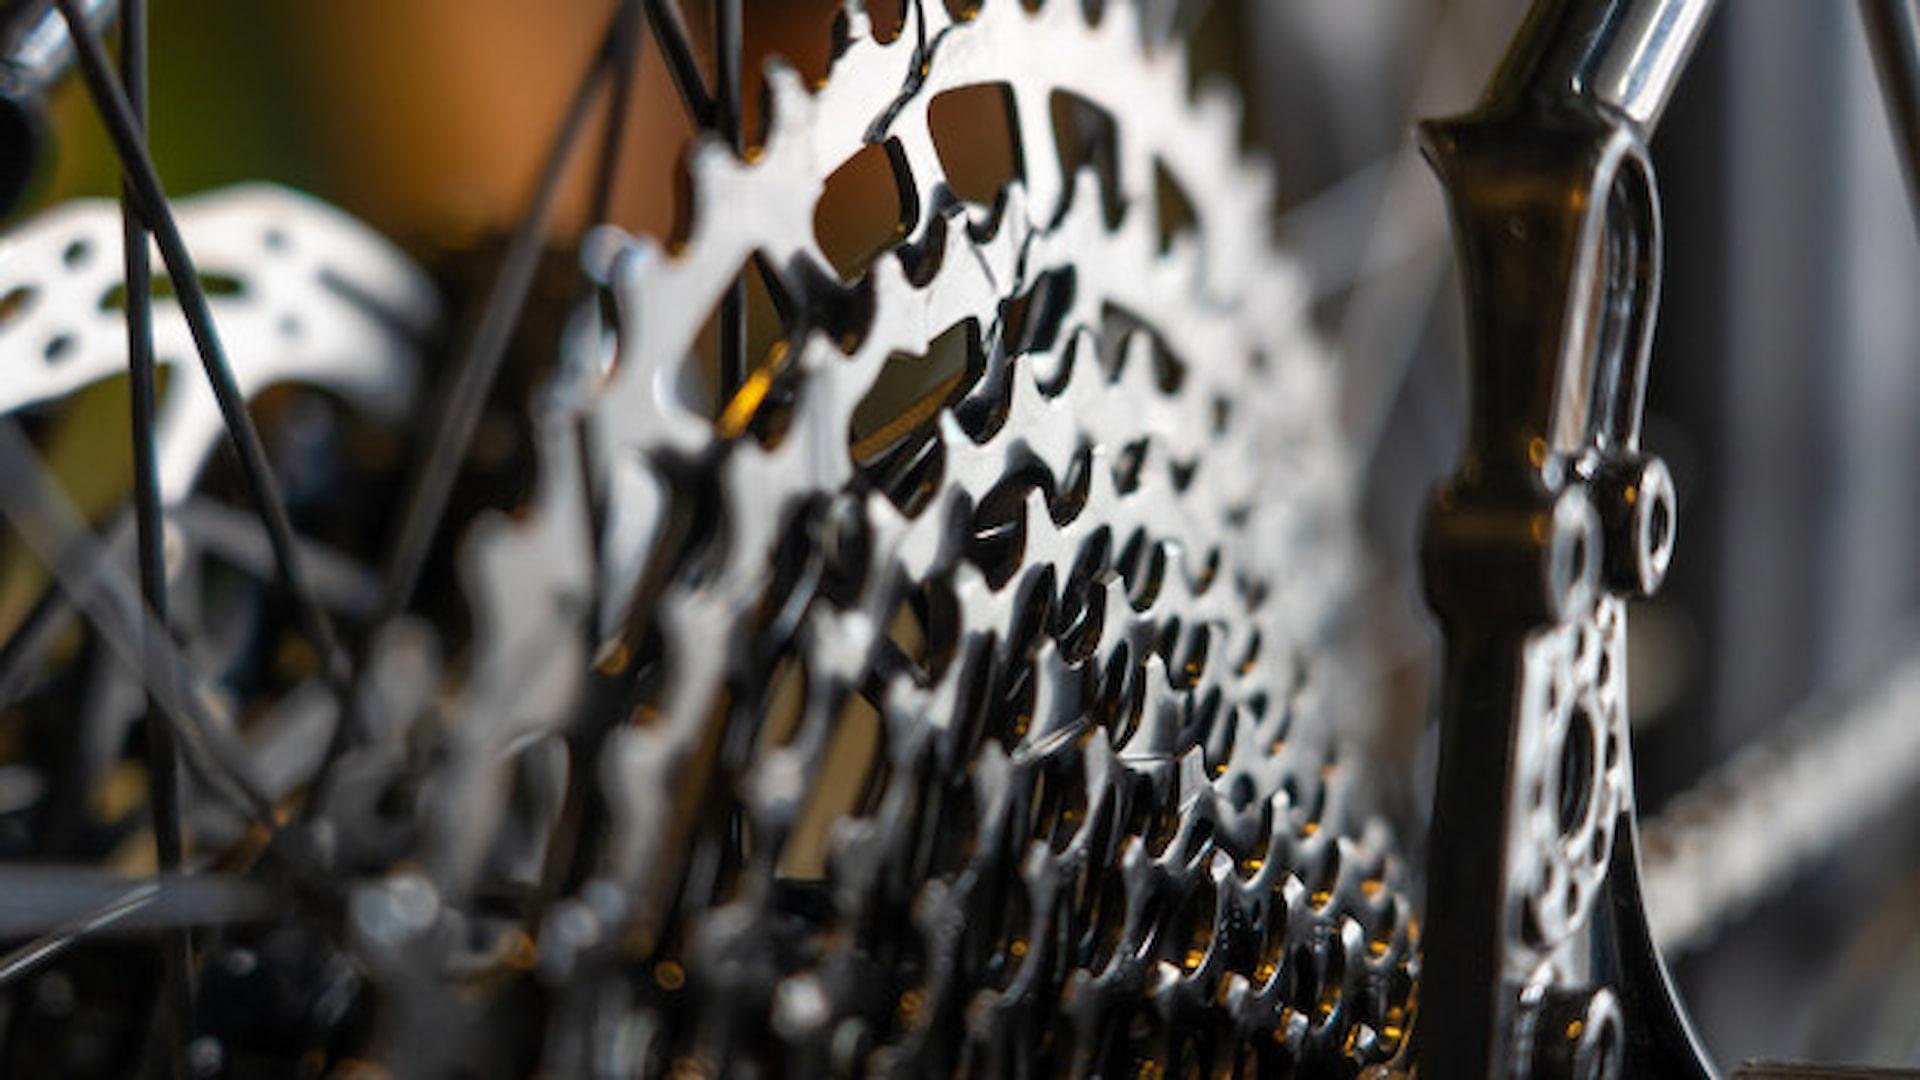 kaseta rowerowa ukazana z bliska